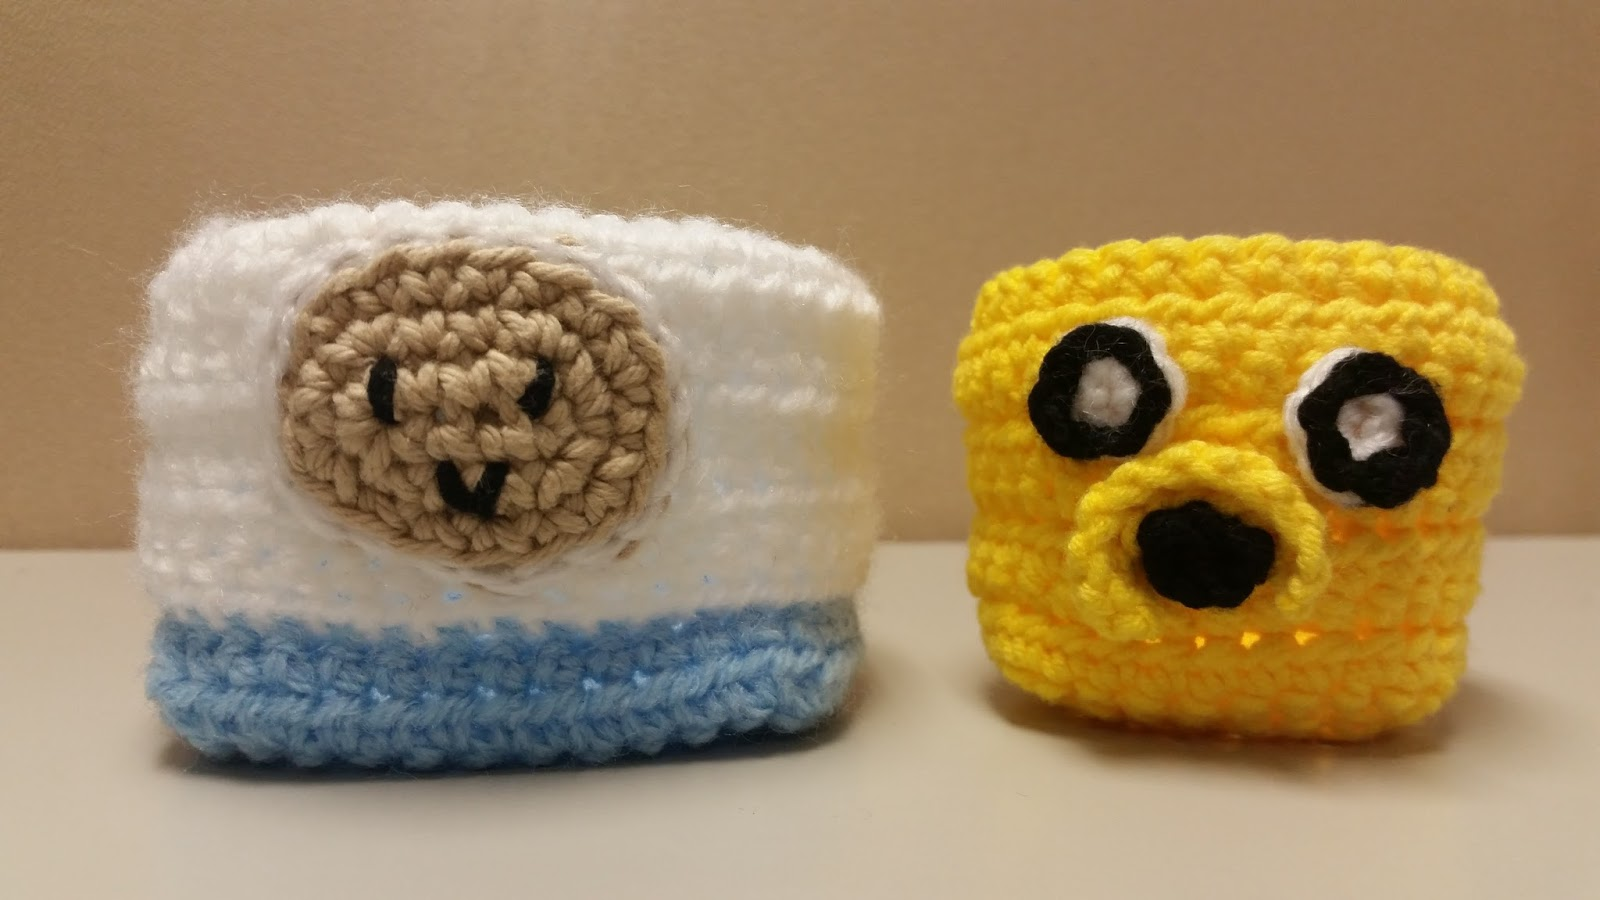 Crochet AF!: Adventure Time Finn and Jake Mini Baskets